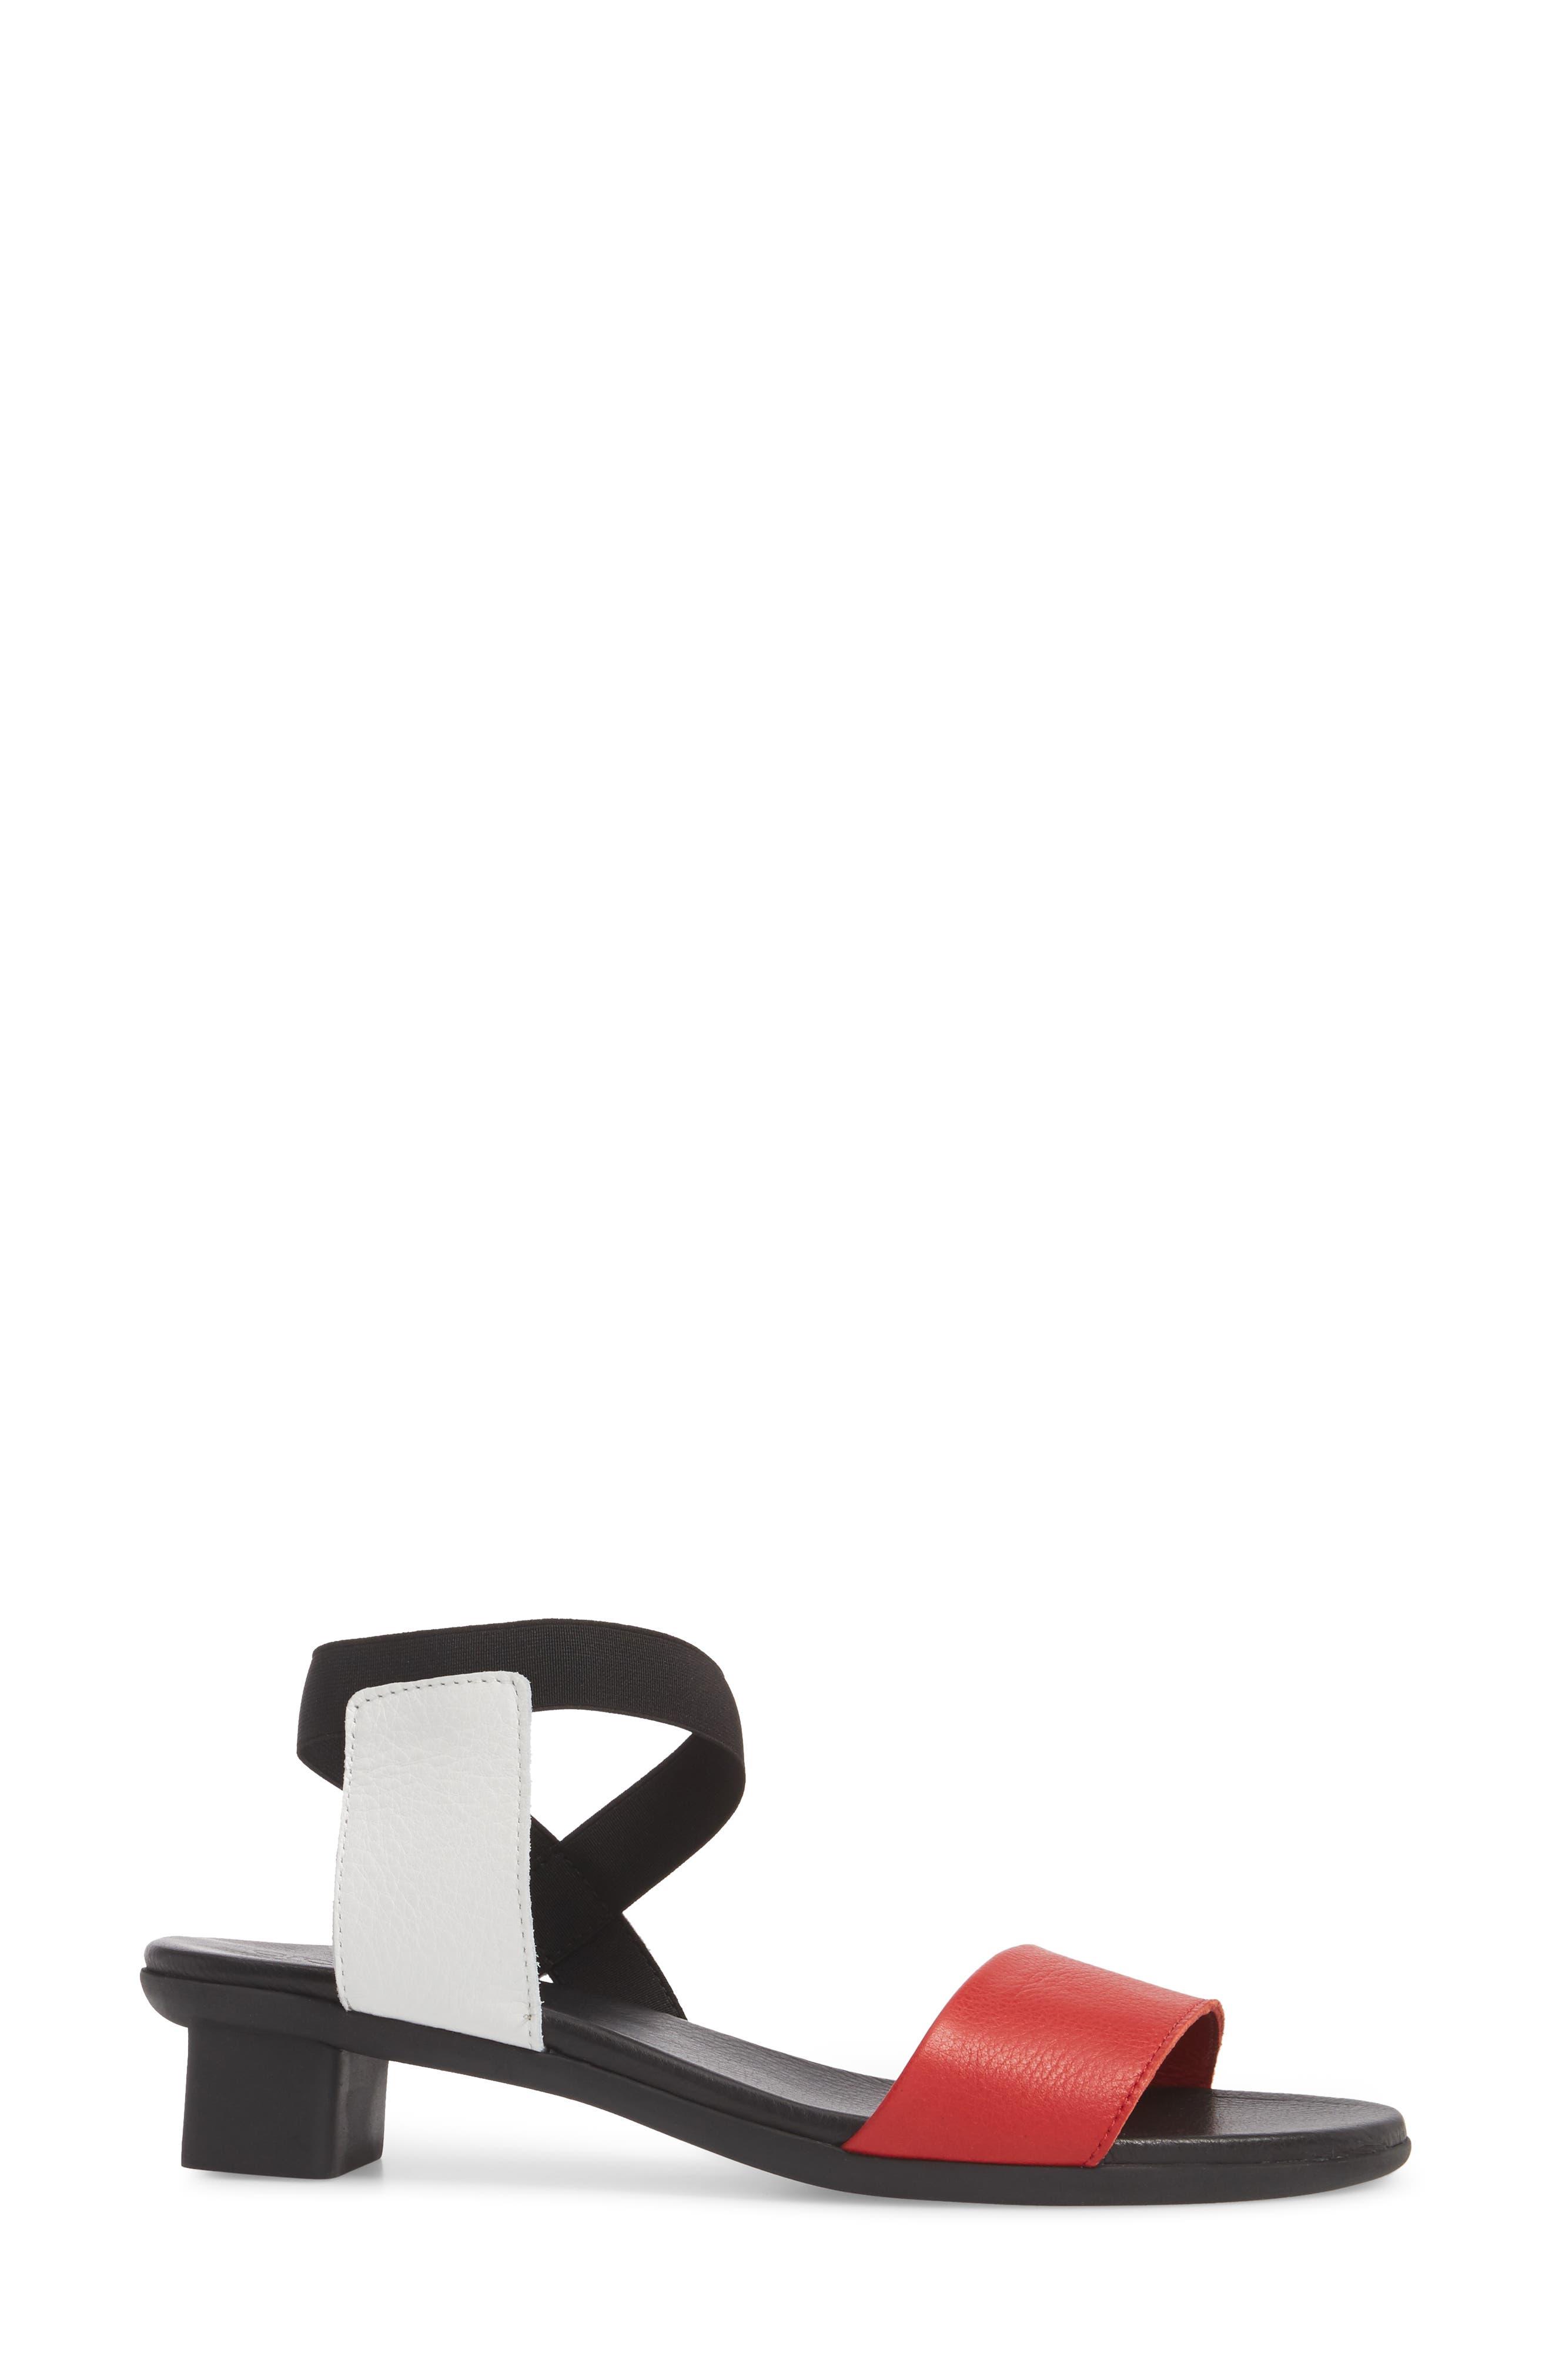 Obiaze Sandal,                             Alternate thumbnail 3, color,                             611